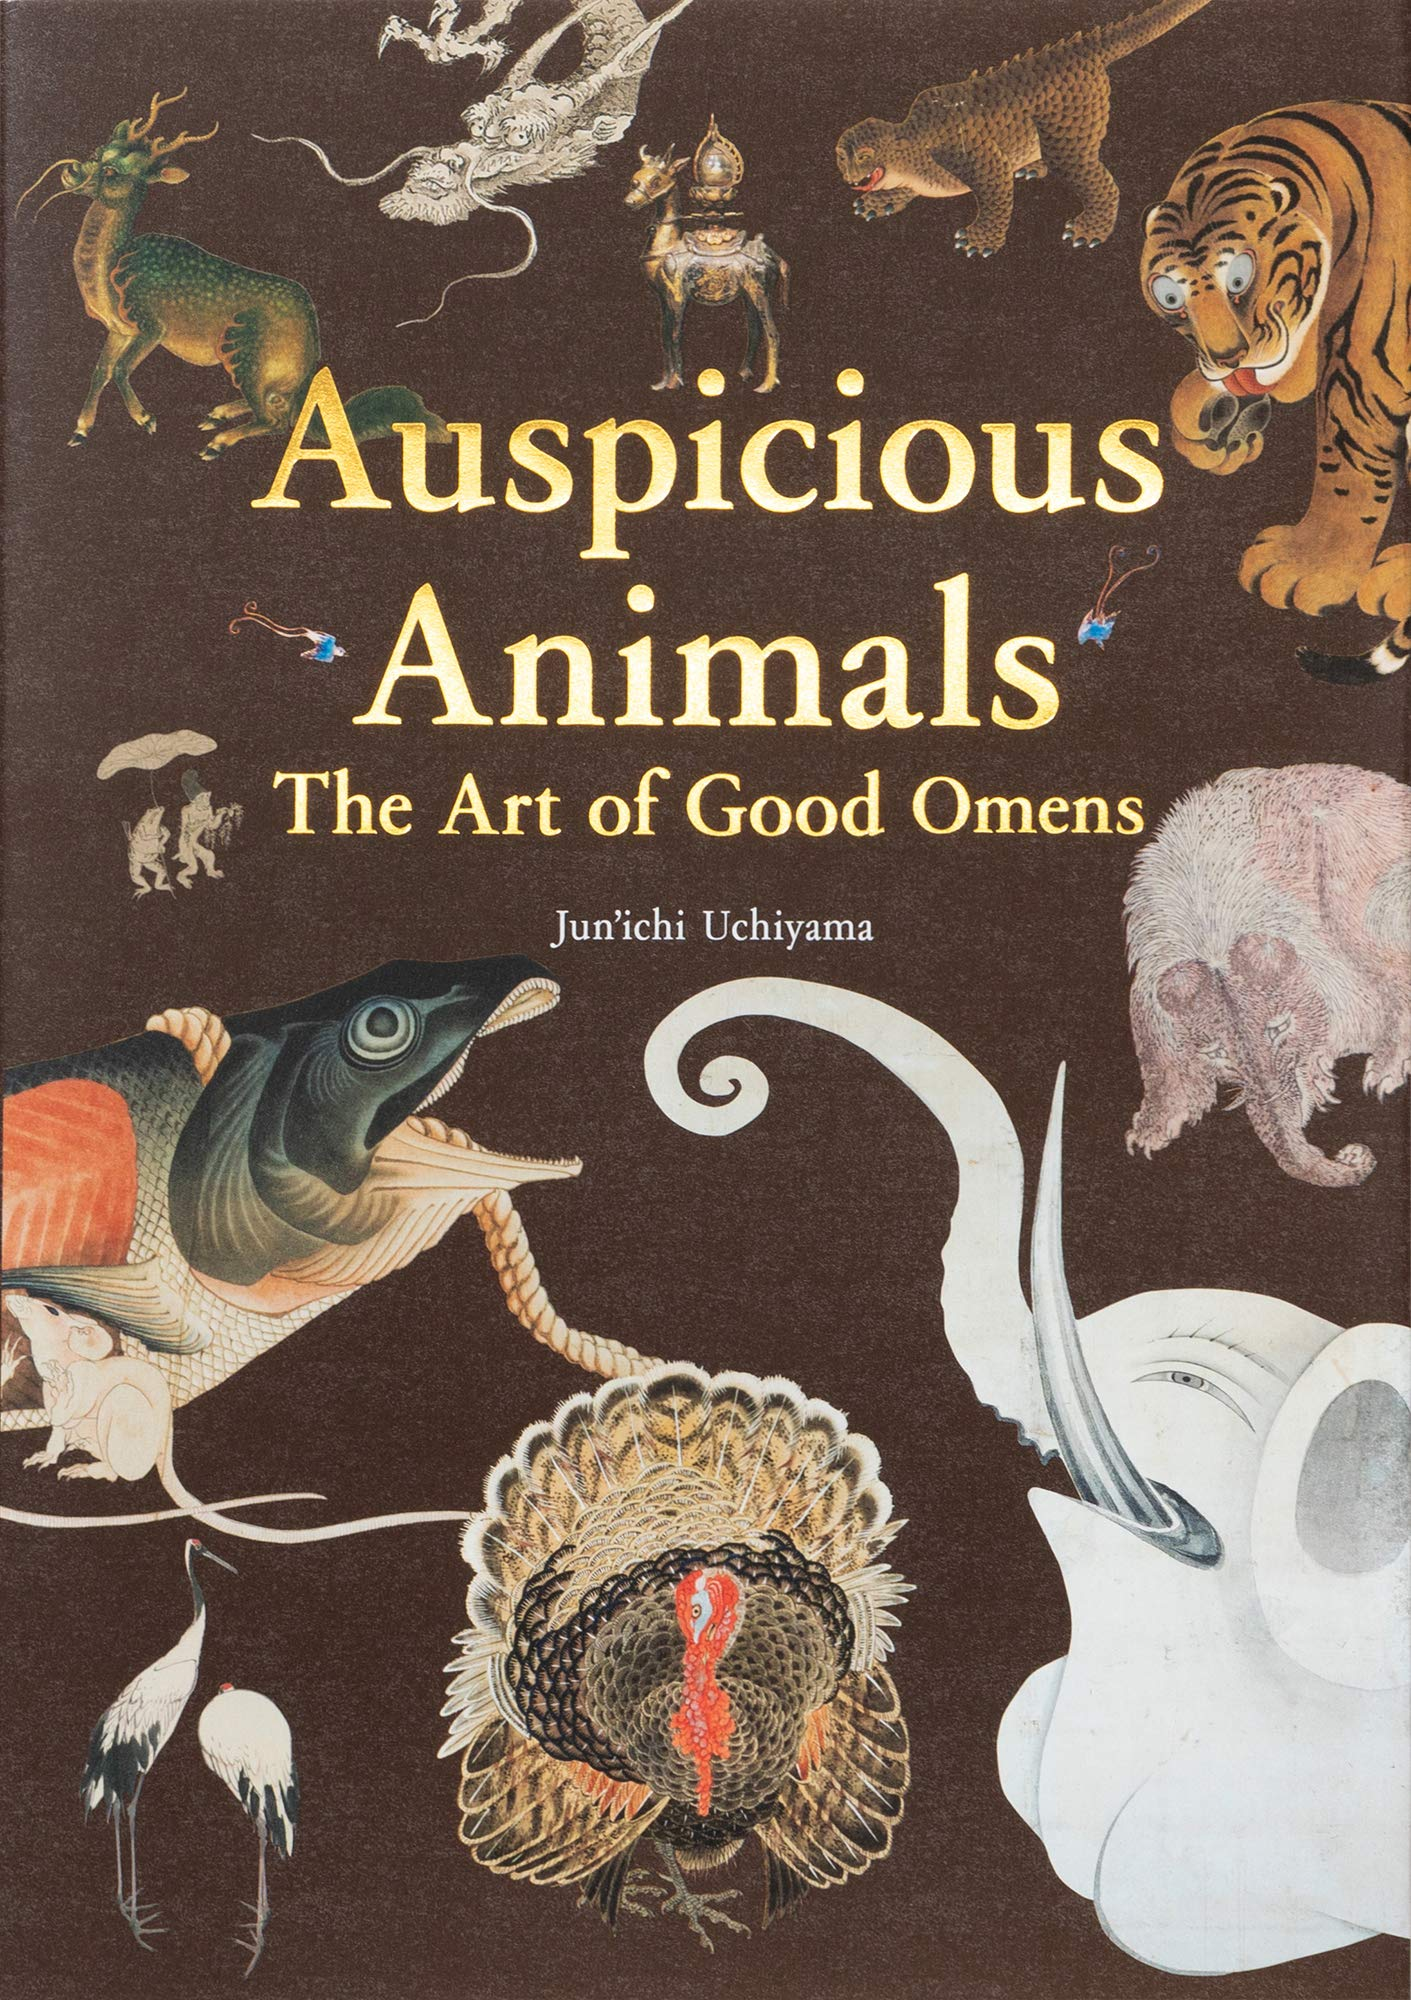 Auspicious Animals The Art of Good Omens: The Art of Good Omens